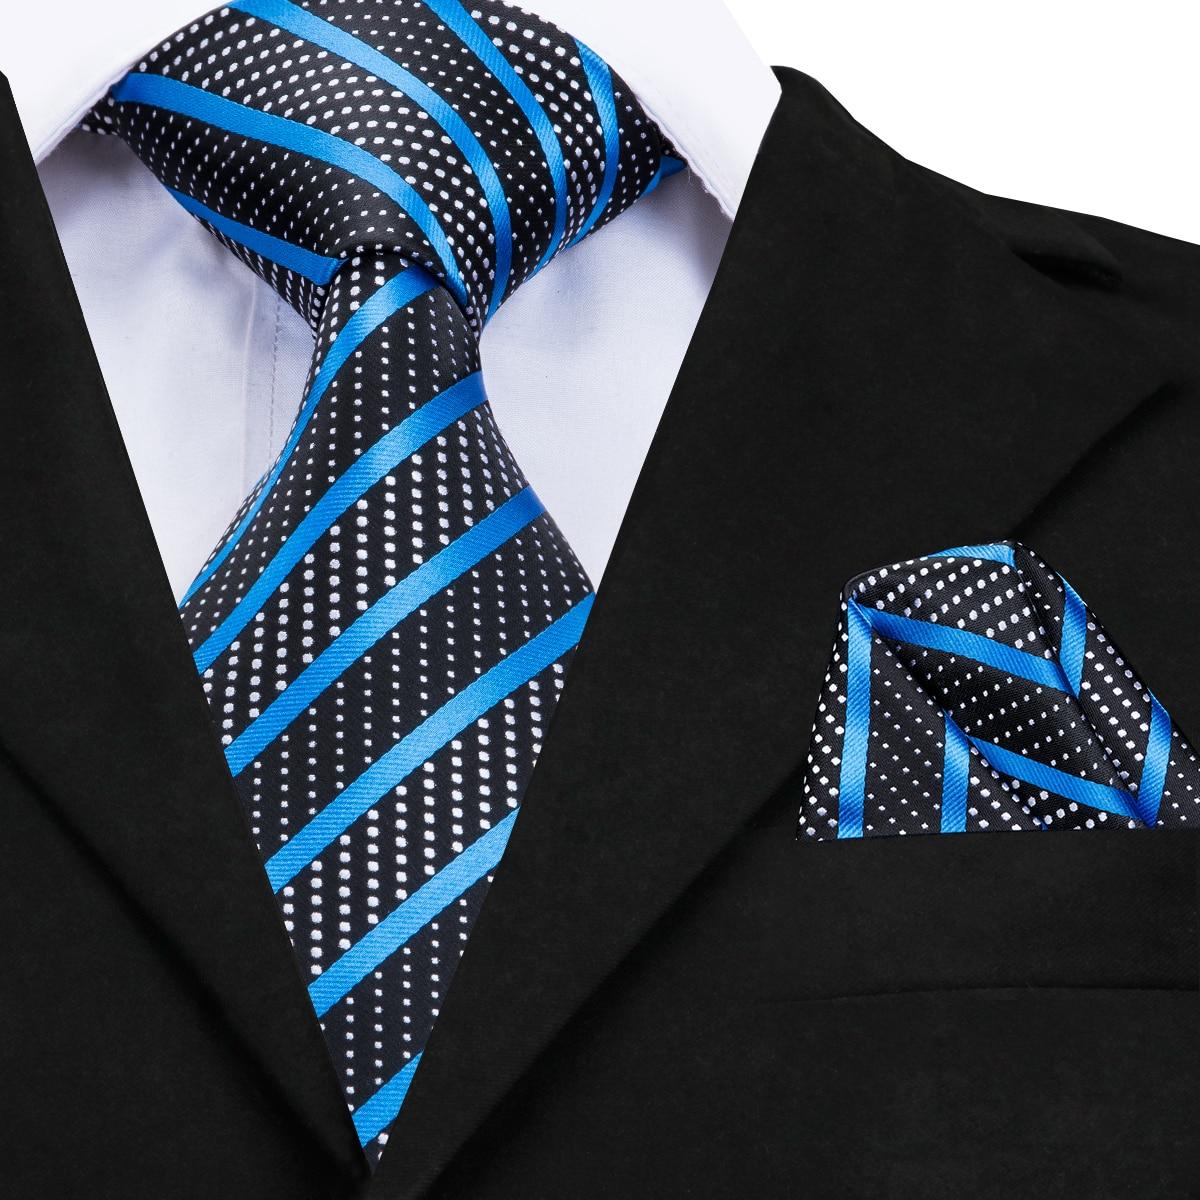 Luxury Silk Tie 2018 Brand Desiger Fashion Blue Striped Ties For Men Business Formal Neck Tie Handky Without Cufflinks CZ-007